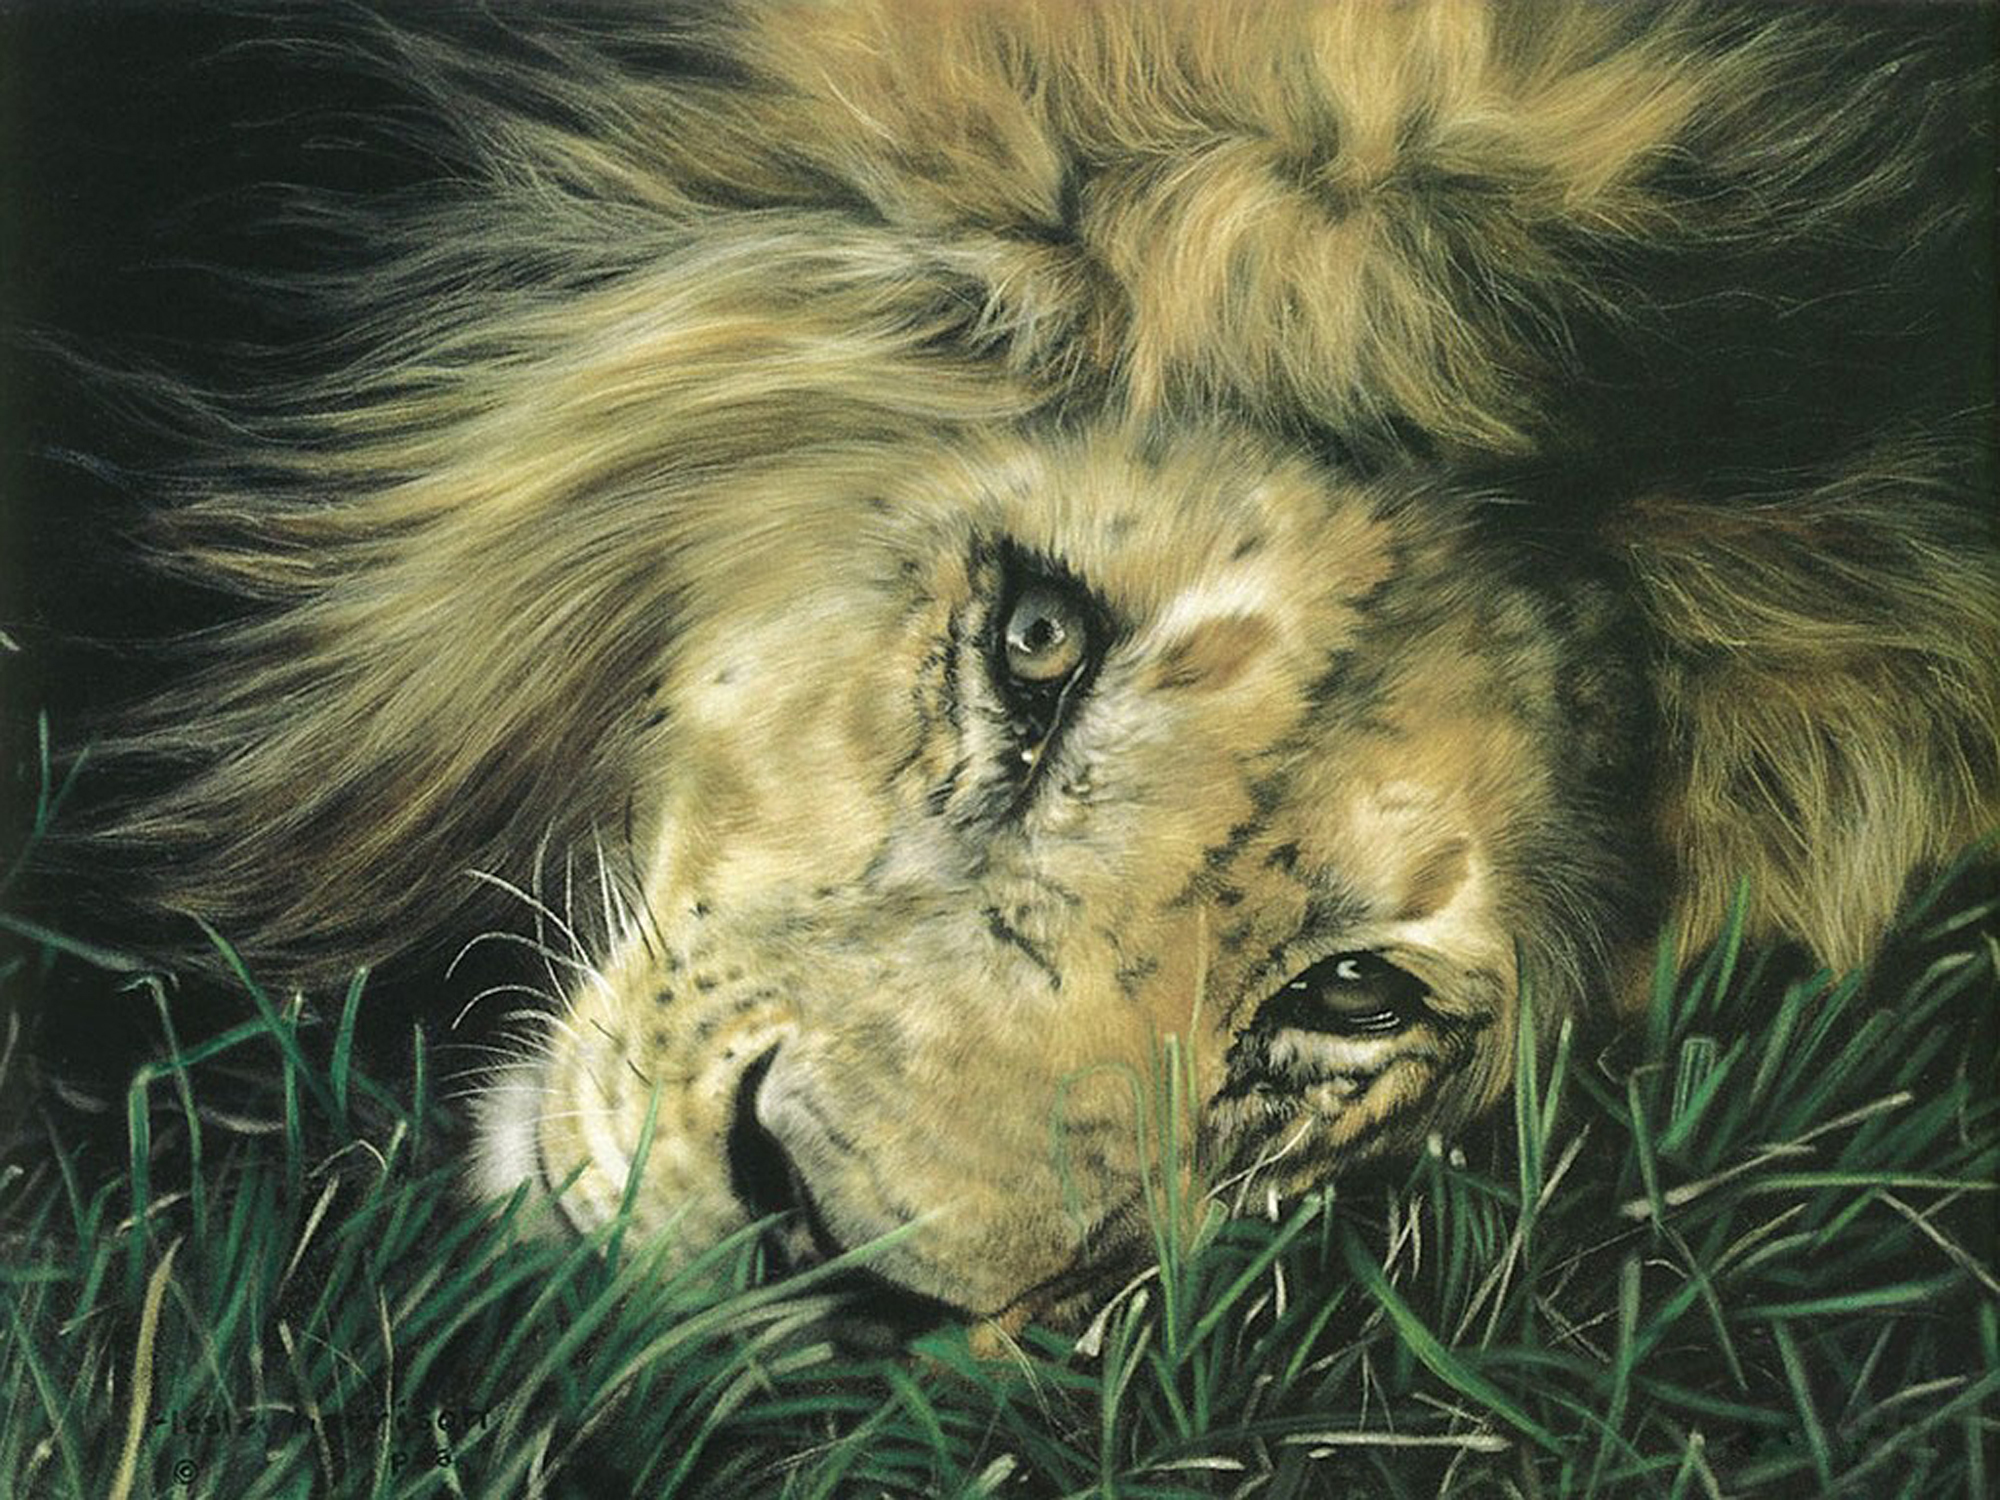 Animal - Lion  Artistic Wallpaper